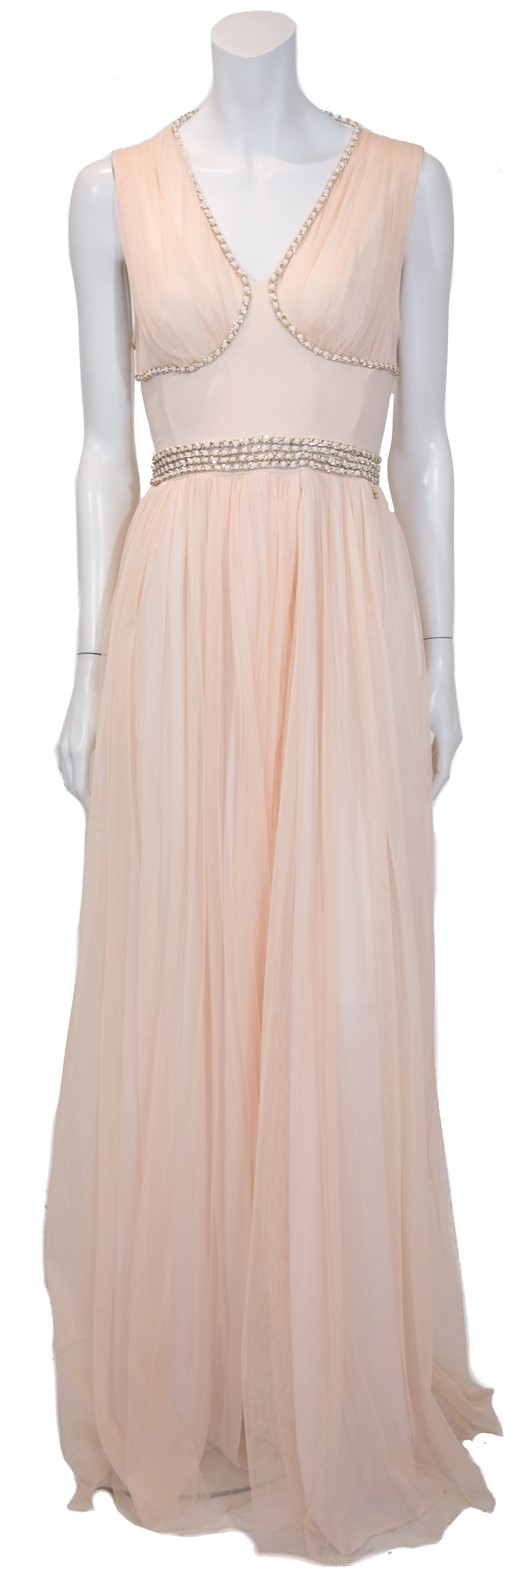 Maxi φόρεμα Elisabetta Franchi nude με αλυσίδες